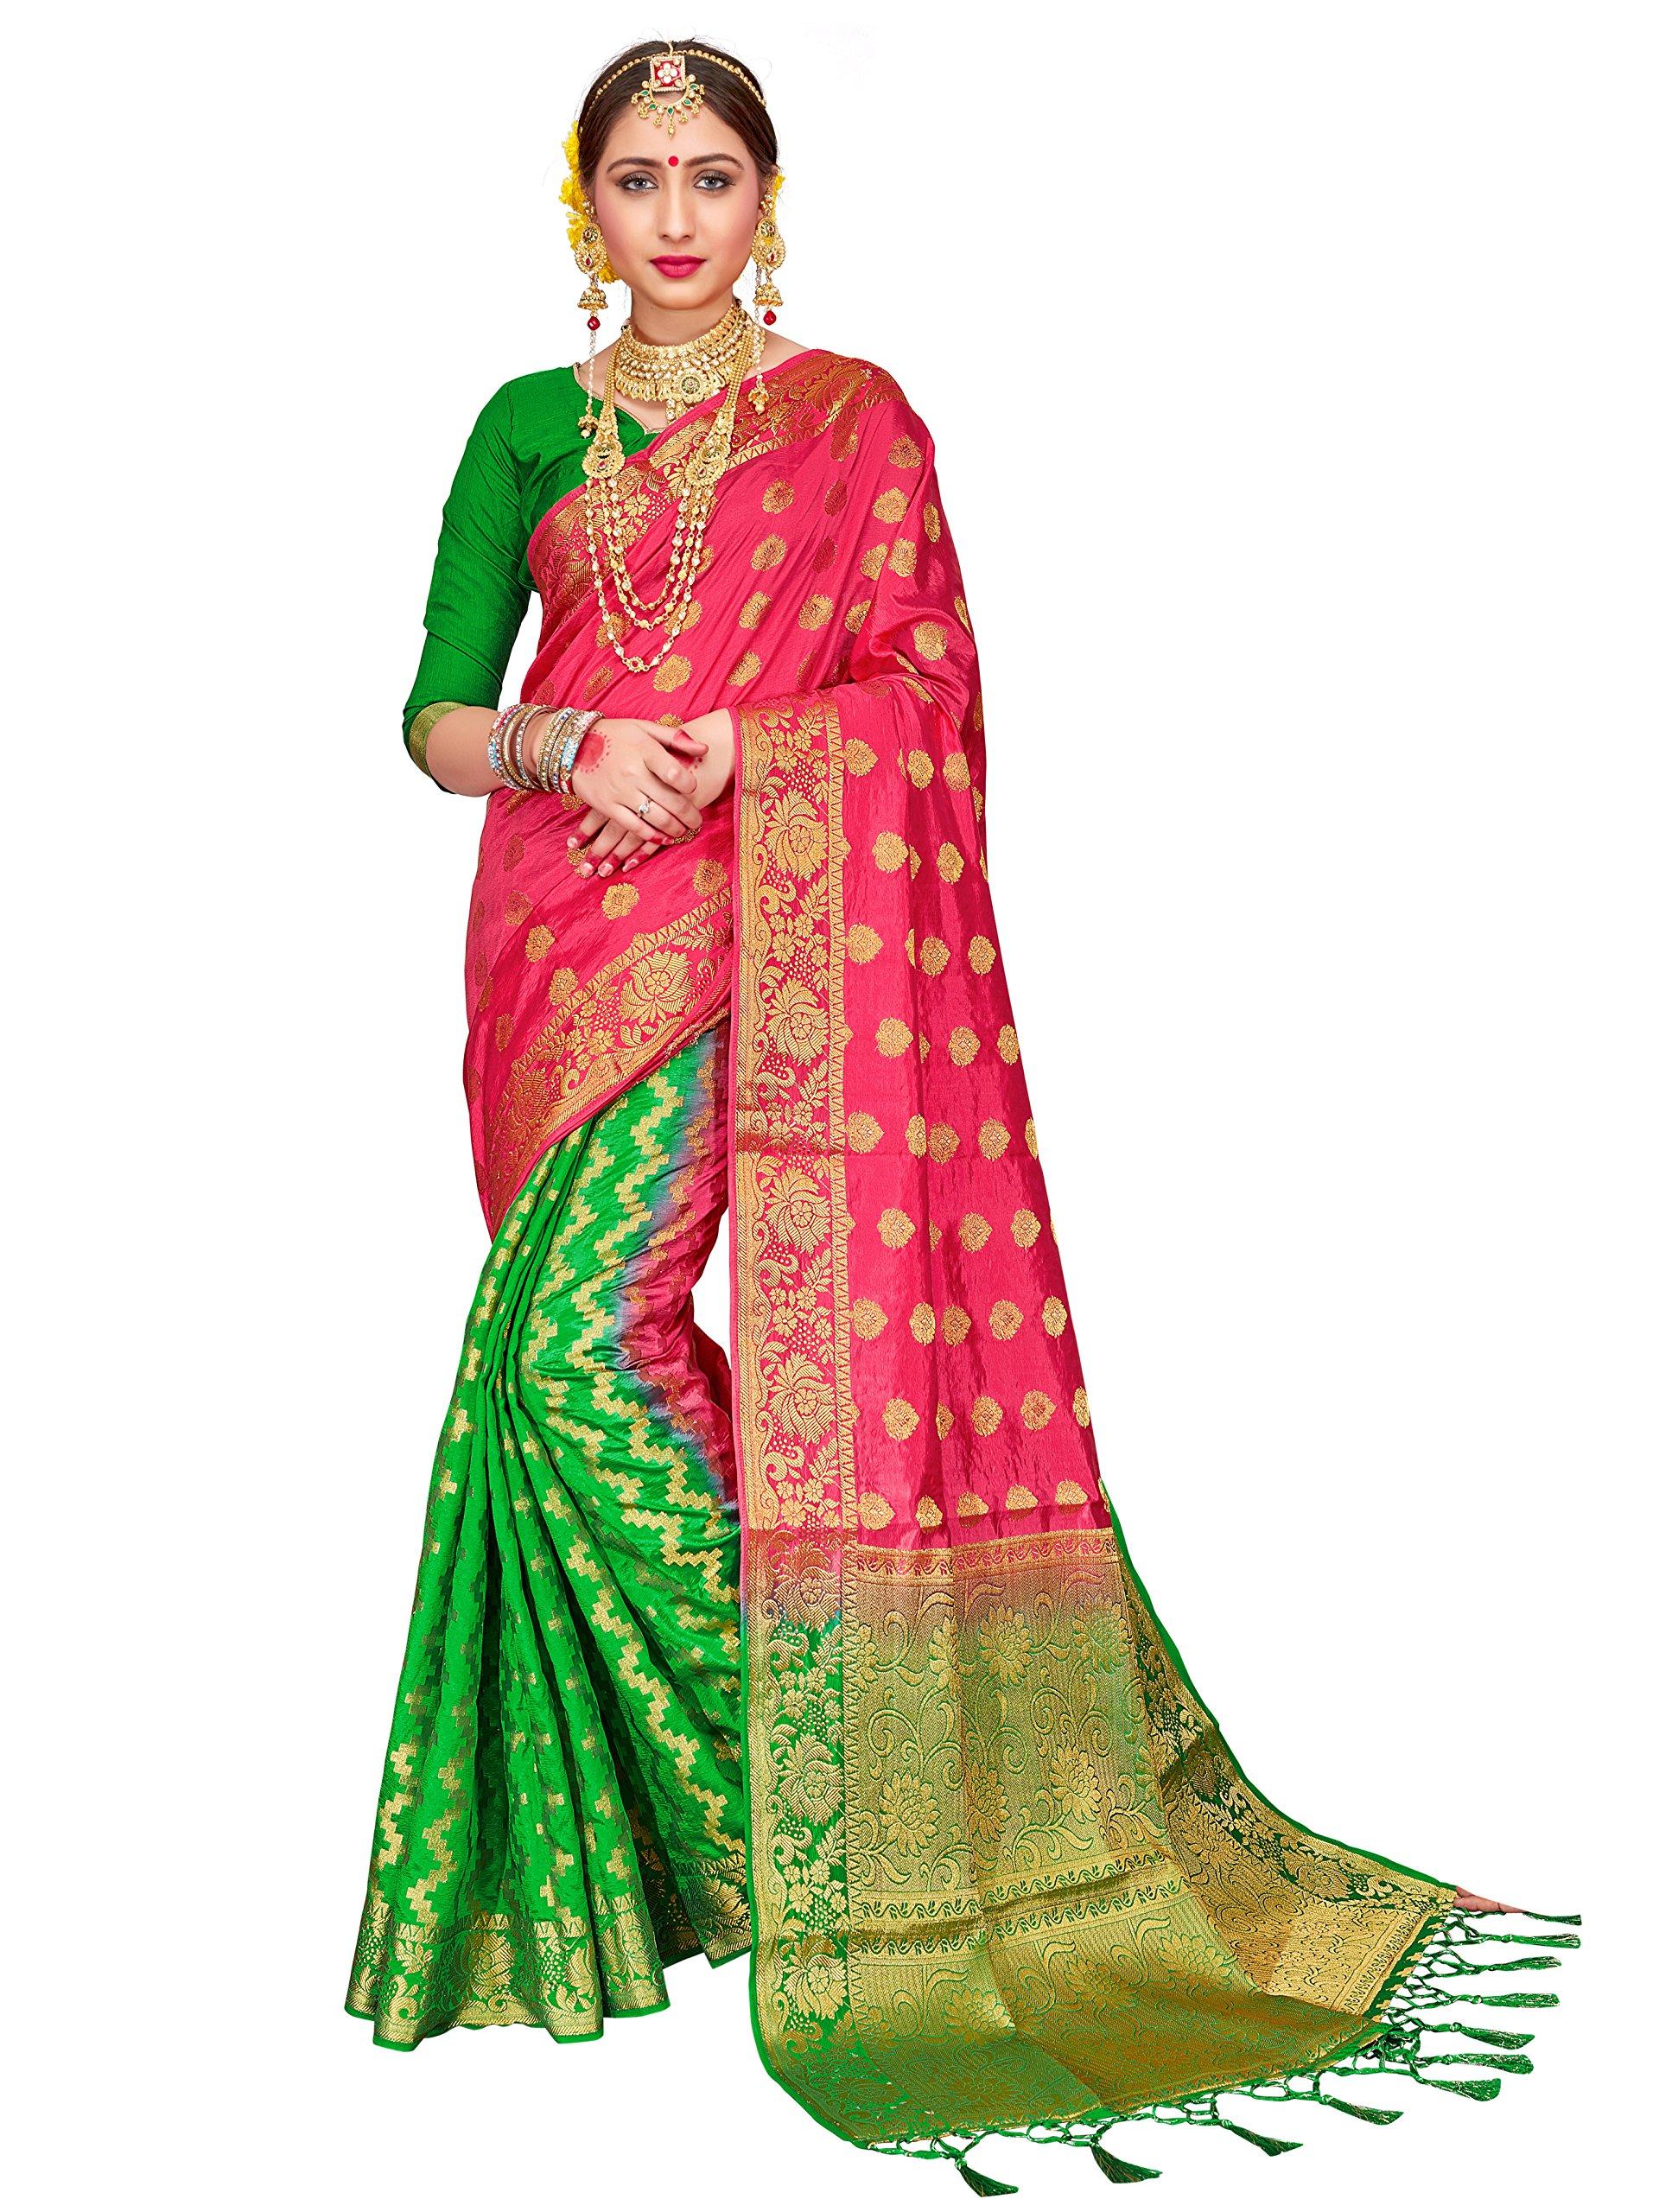 ELINA FASHION Sarees for Women Banarasi Art Silk Woven Work Saree l Indian Wedding Ethnic Wear Sari & Blouse Piece (Pink 2)